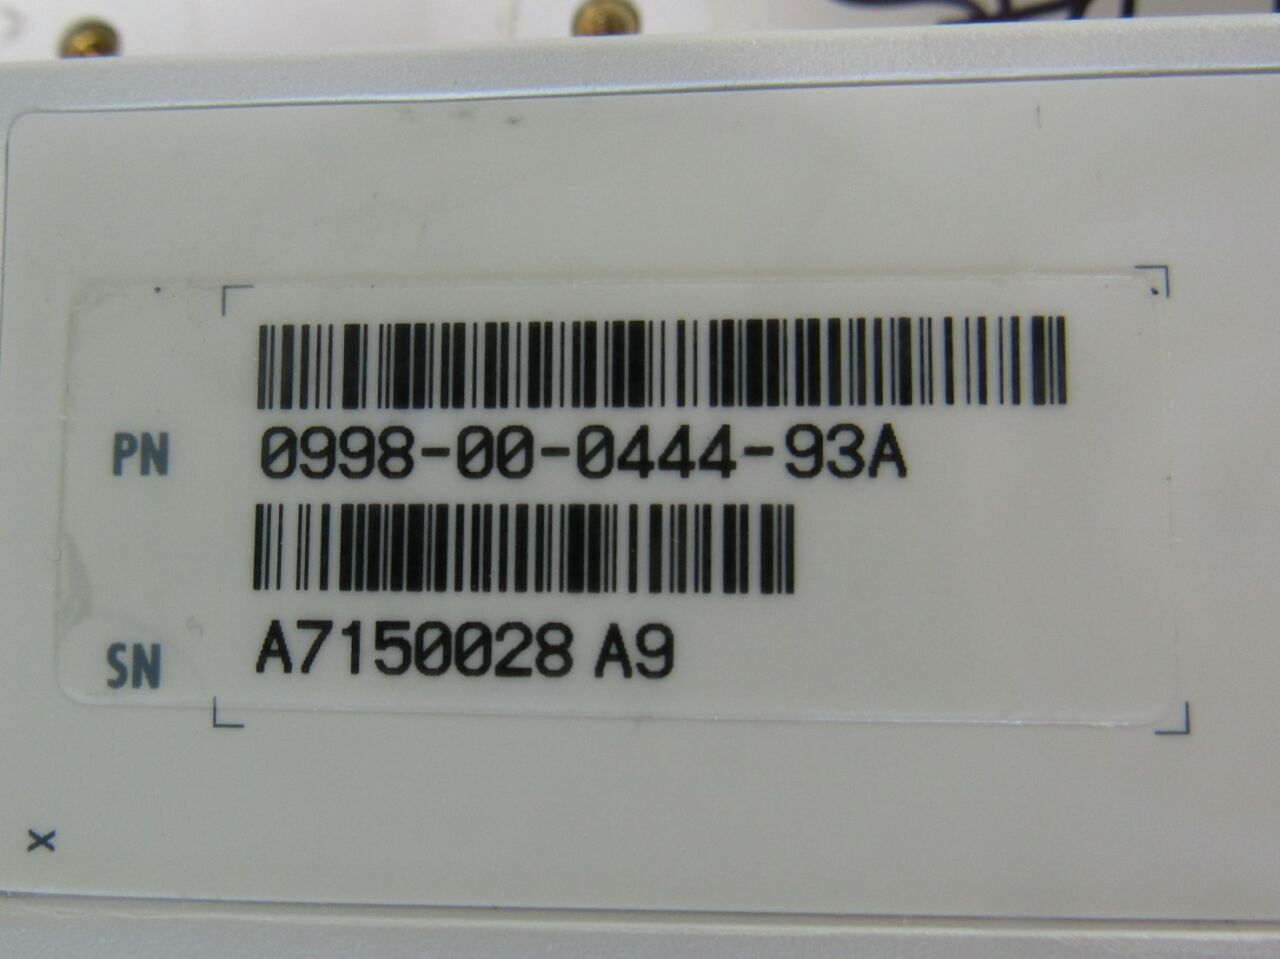 DATASCOPE Accutorr Plus  - Lot of 3 Monitor